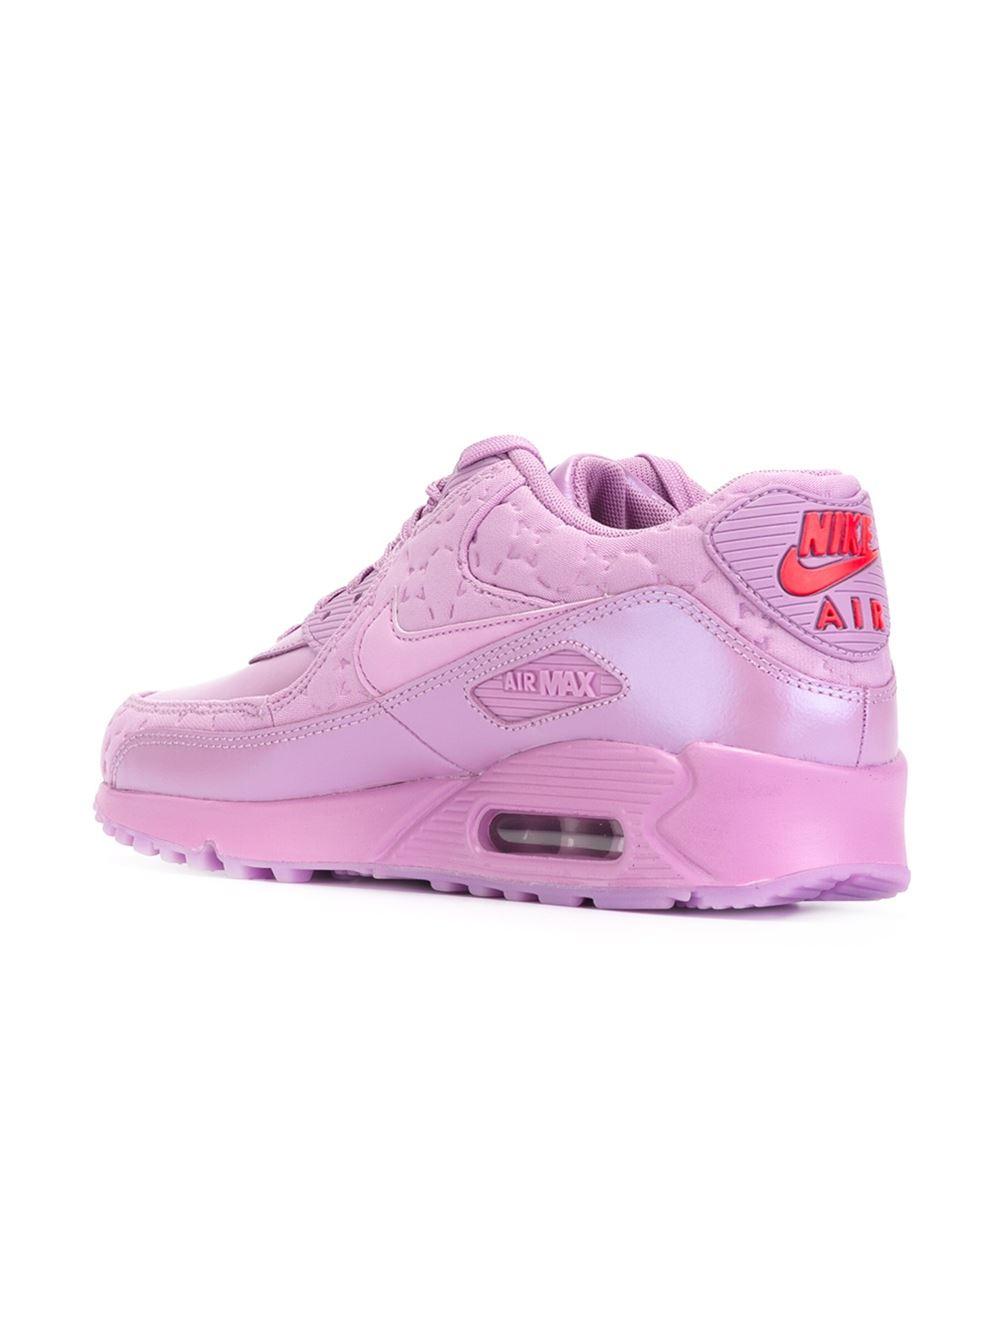 Flat Purple Shoes Uk